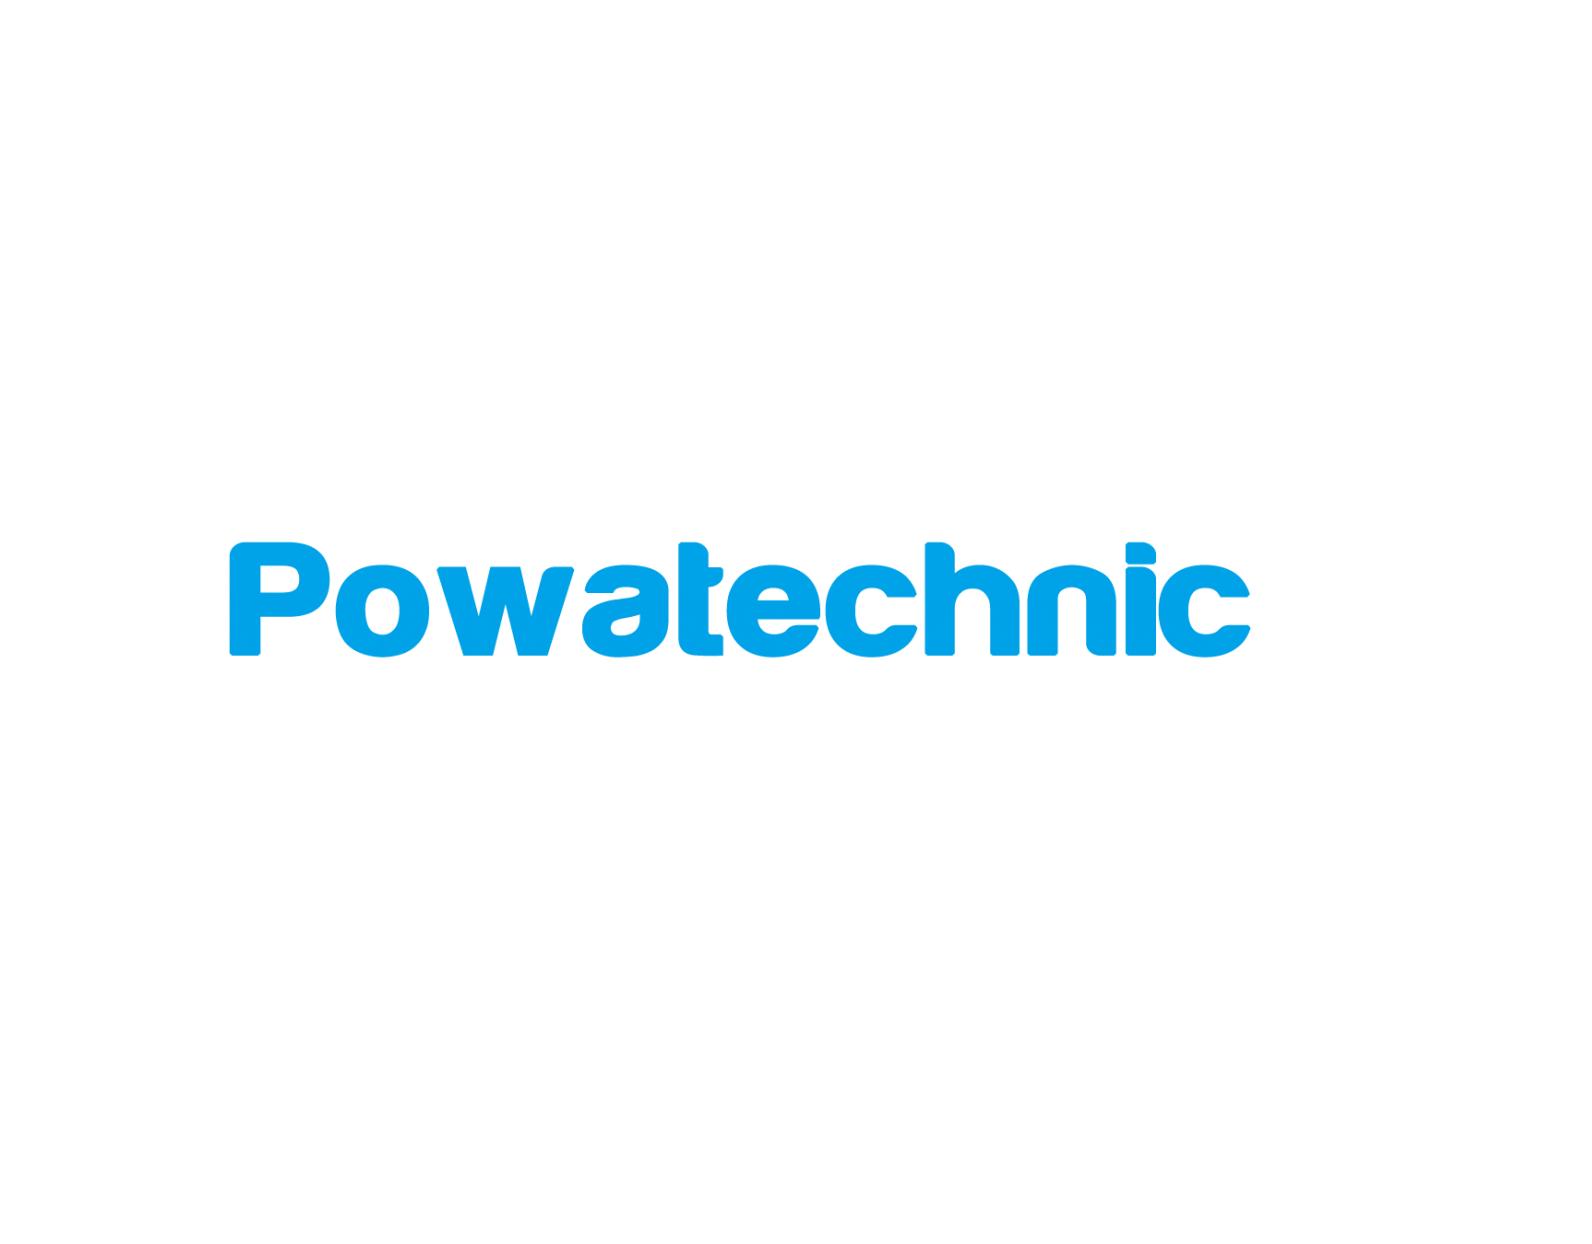 powatechnic 2.png